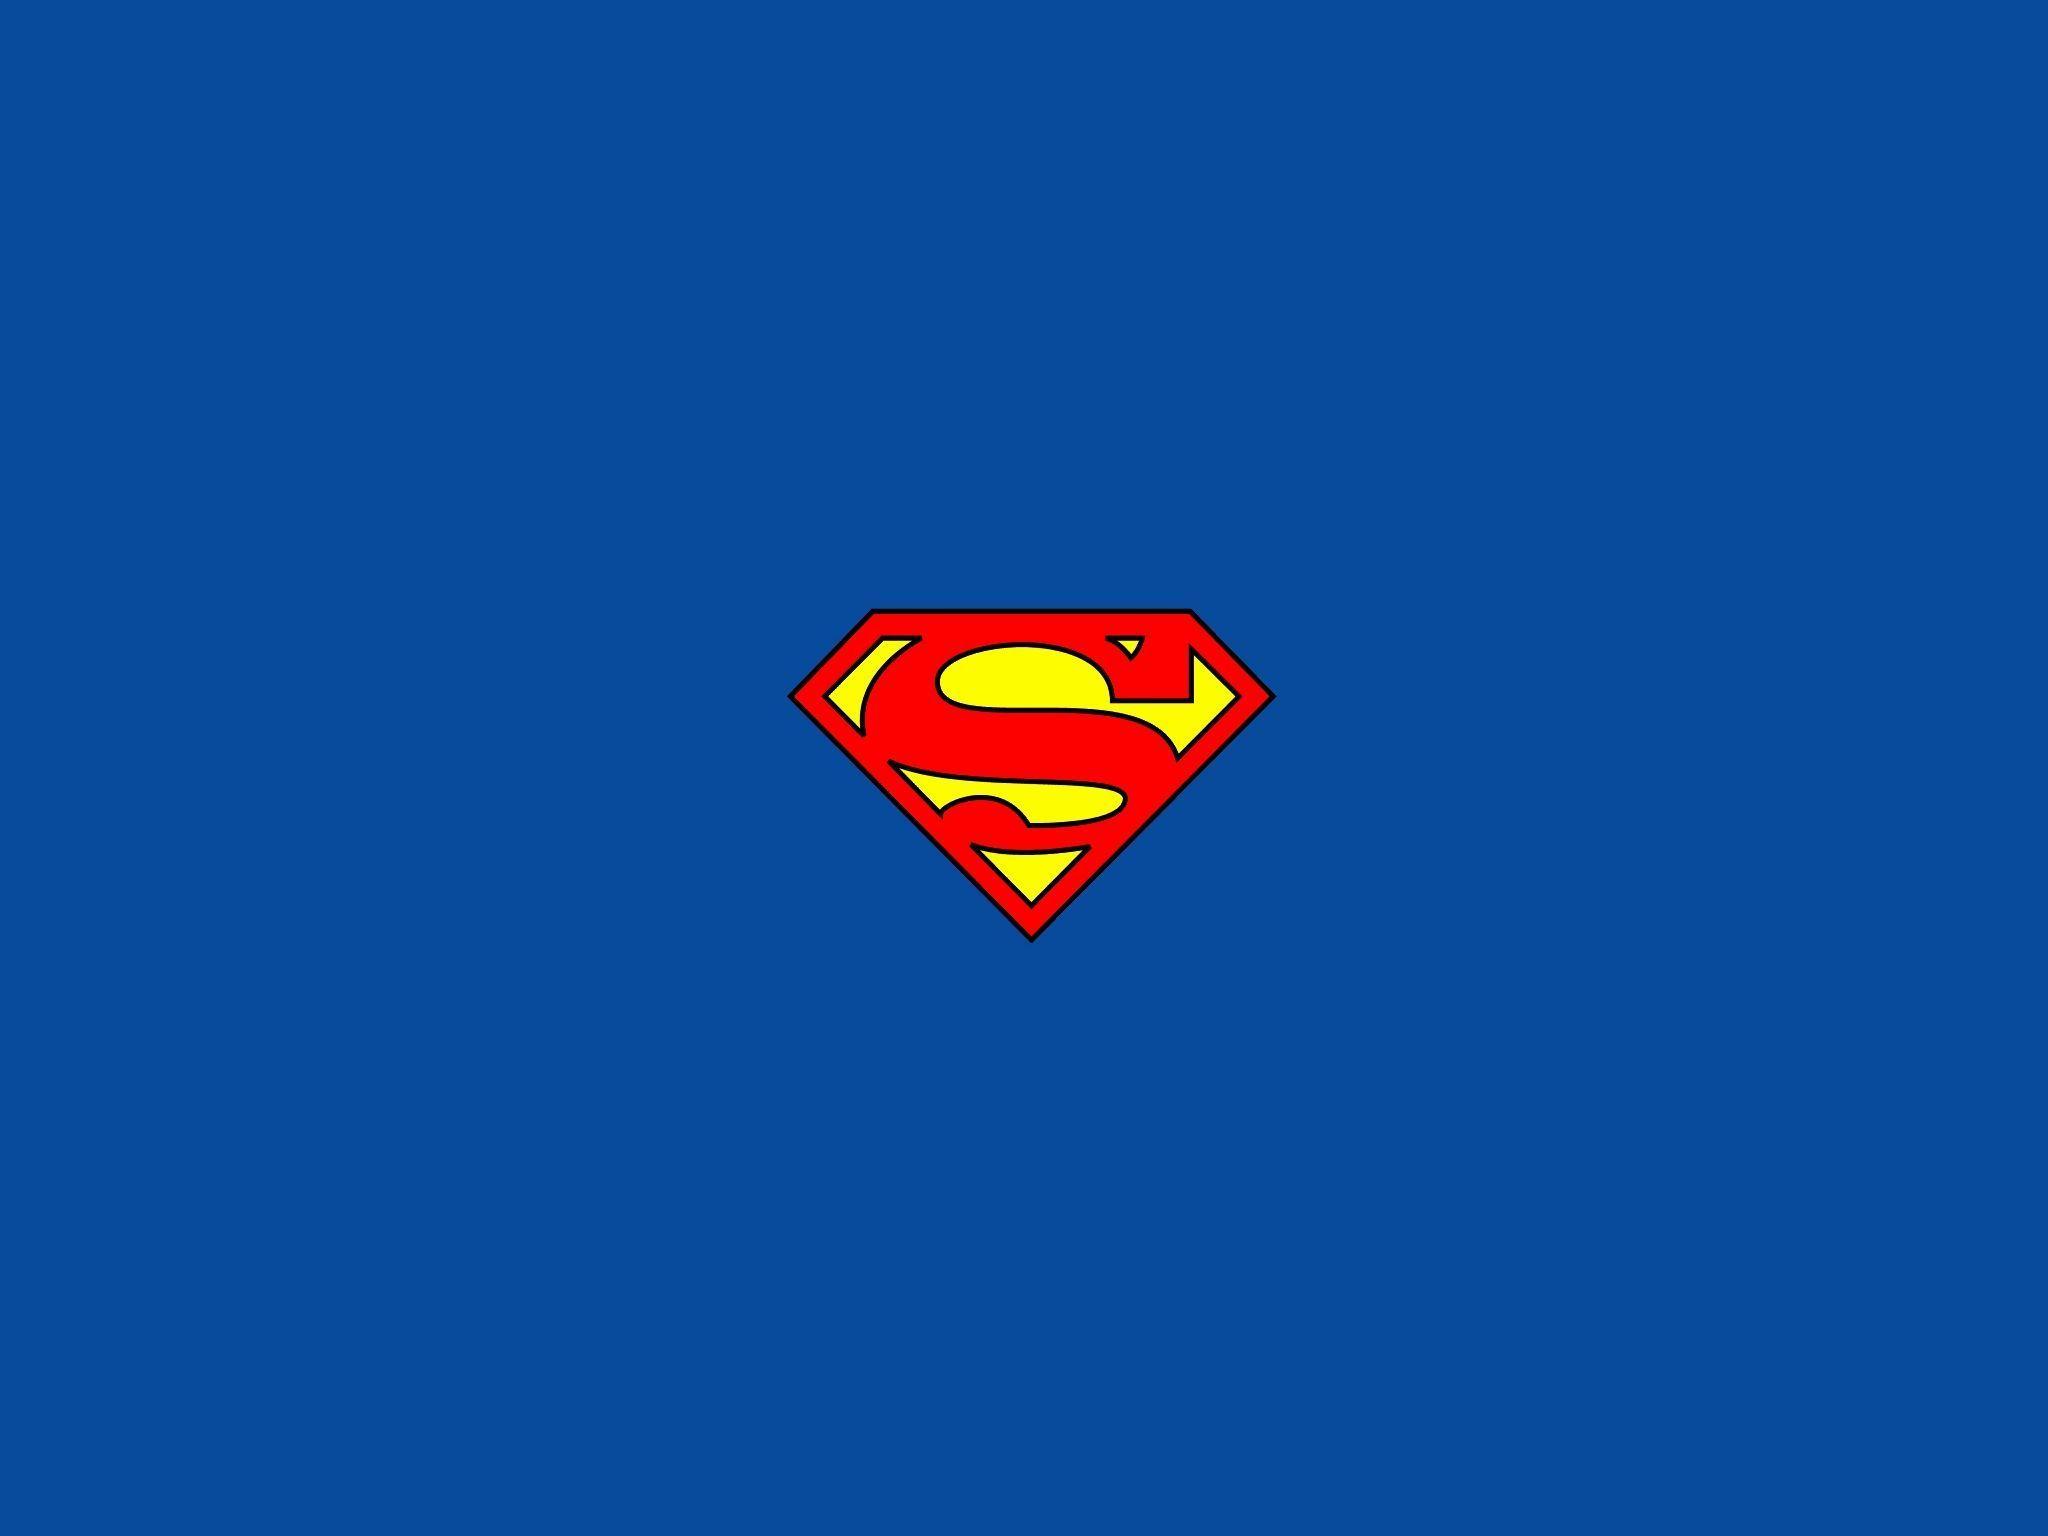 superman logo wallpapers hd as wallpaper hd   fayaz   superman